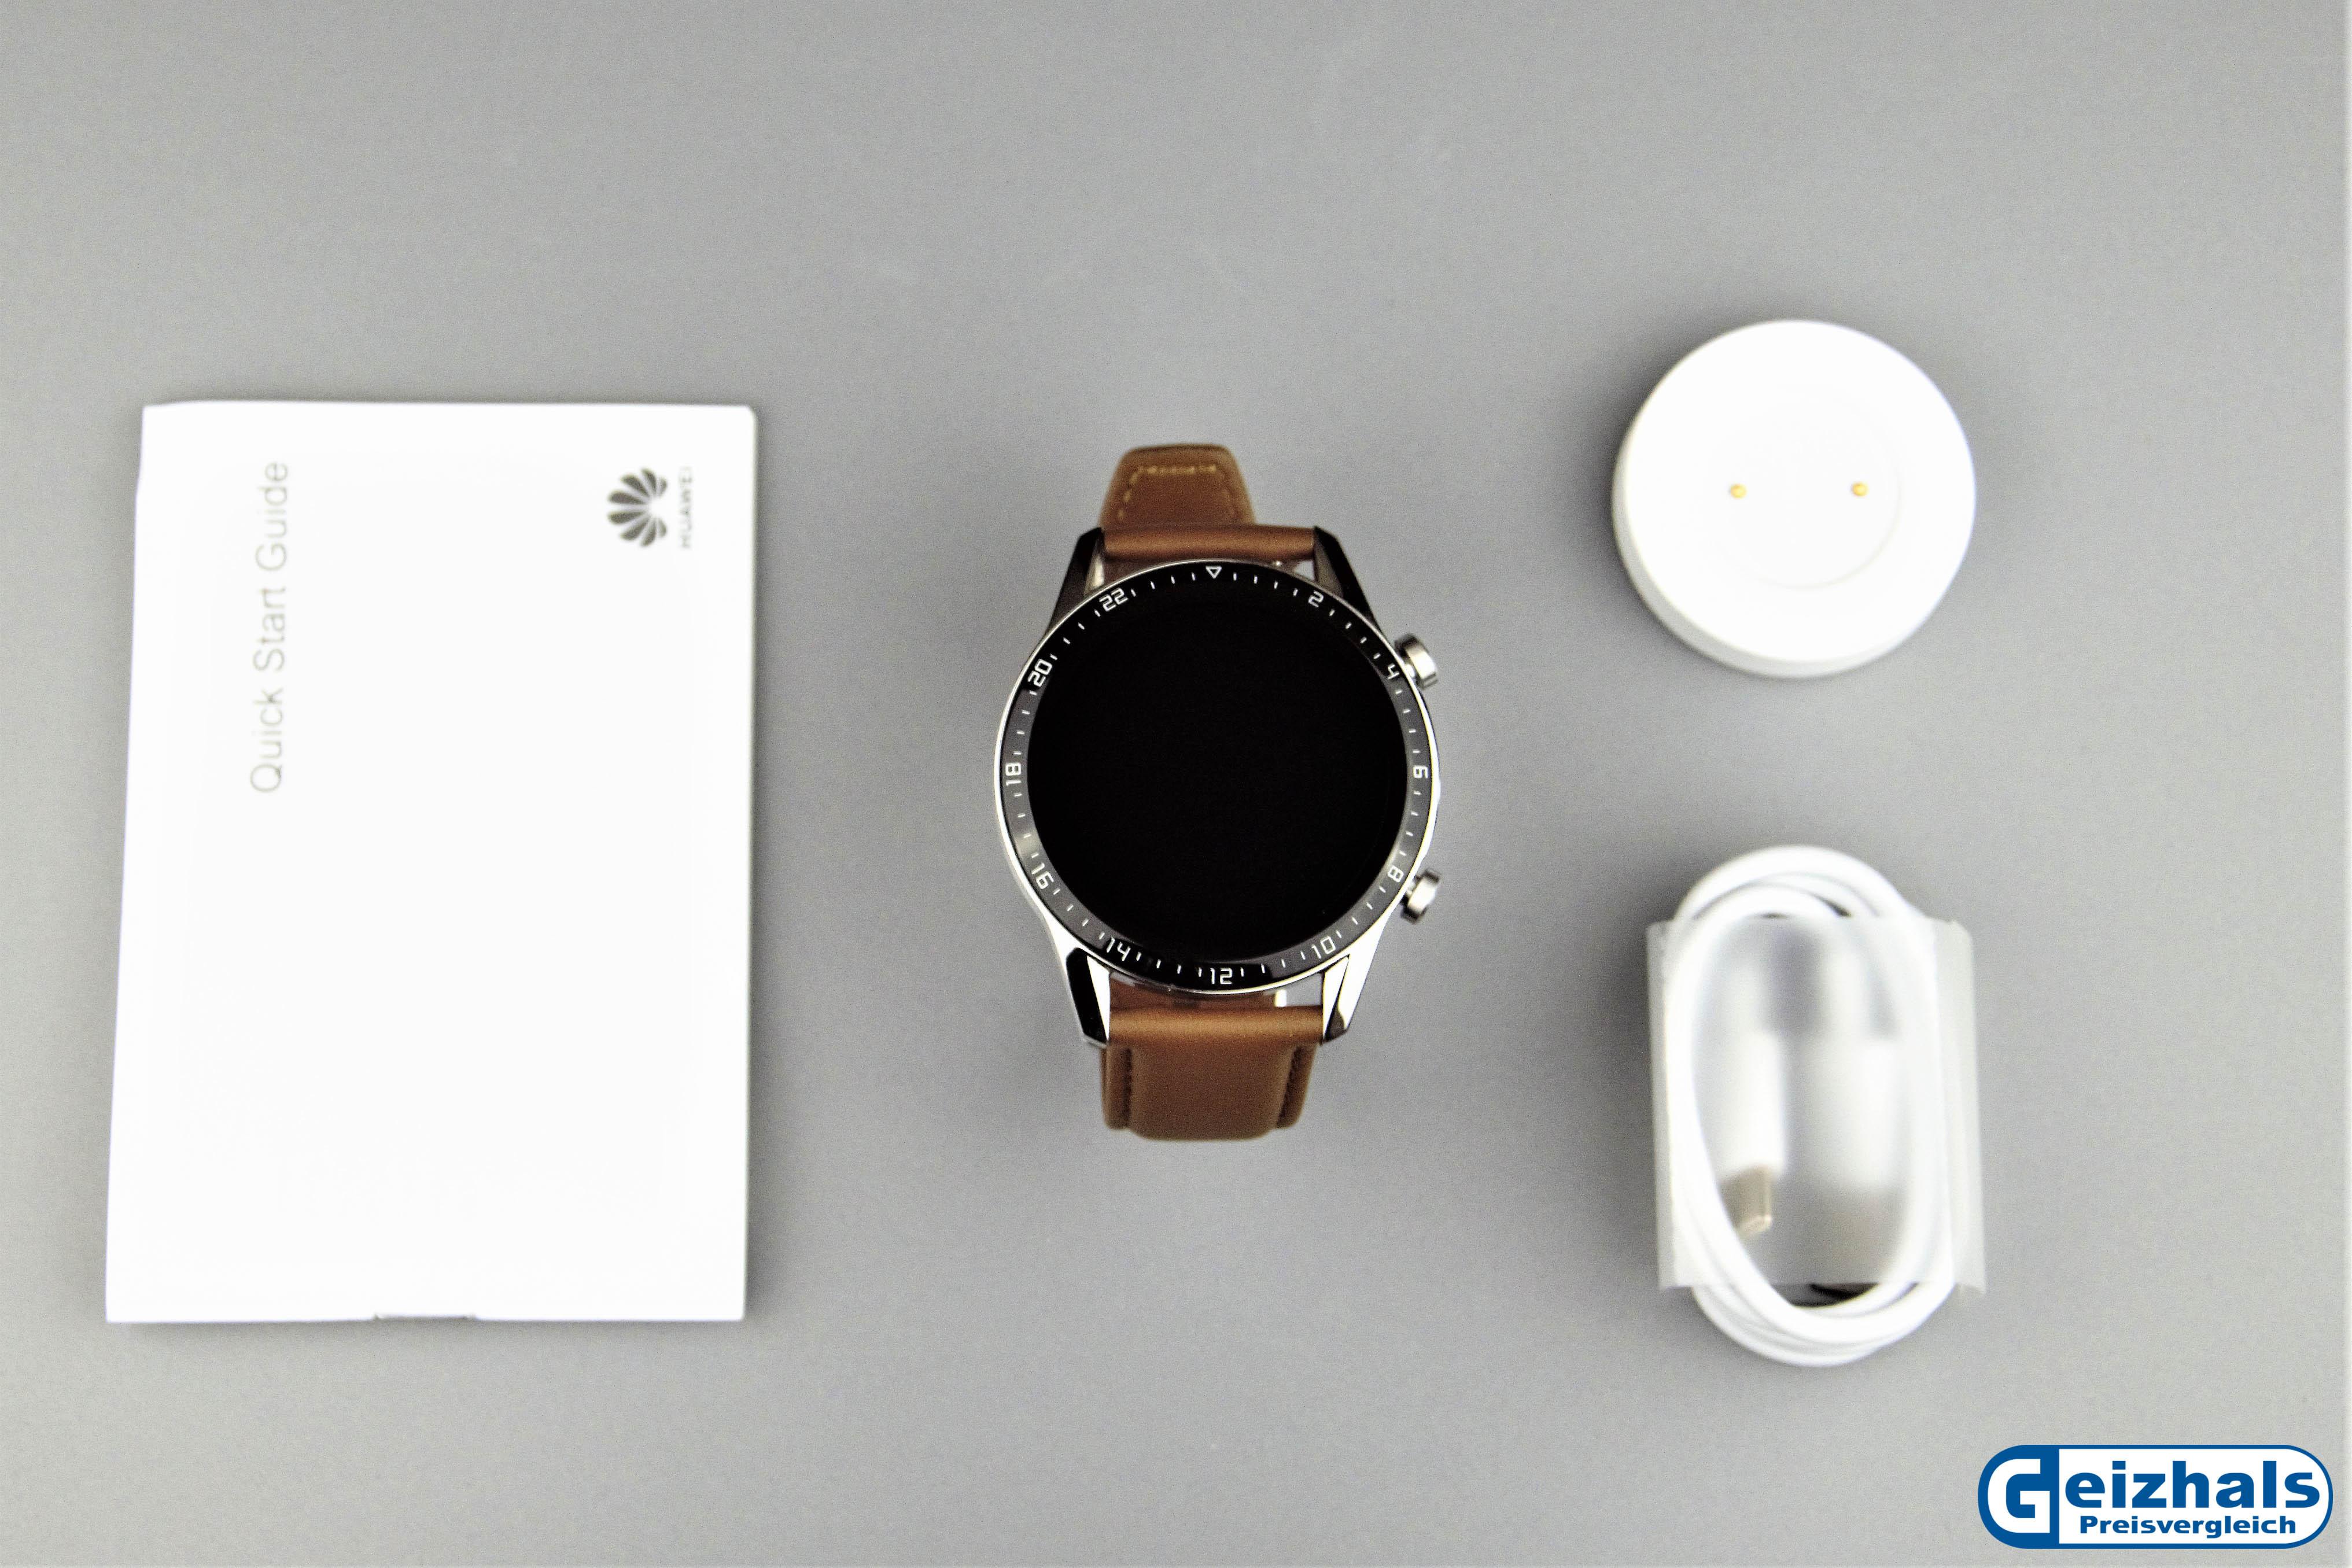 Lieferumfang der Huawei Watch GT 2